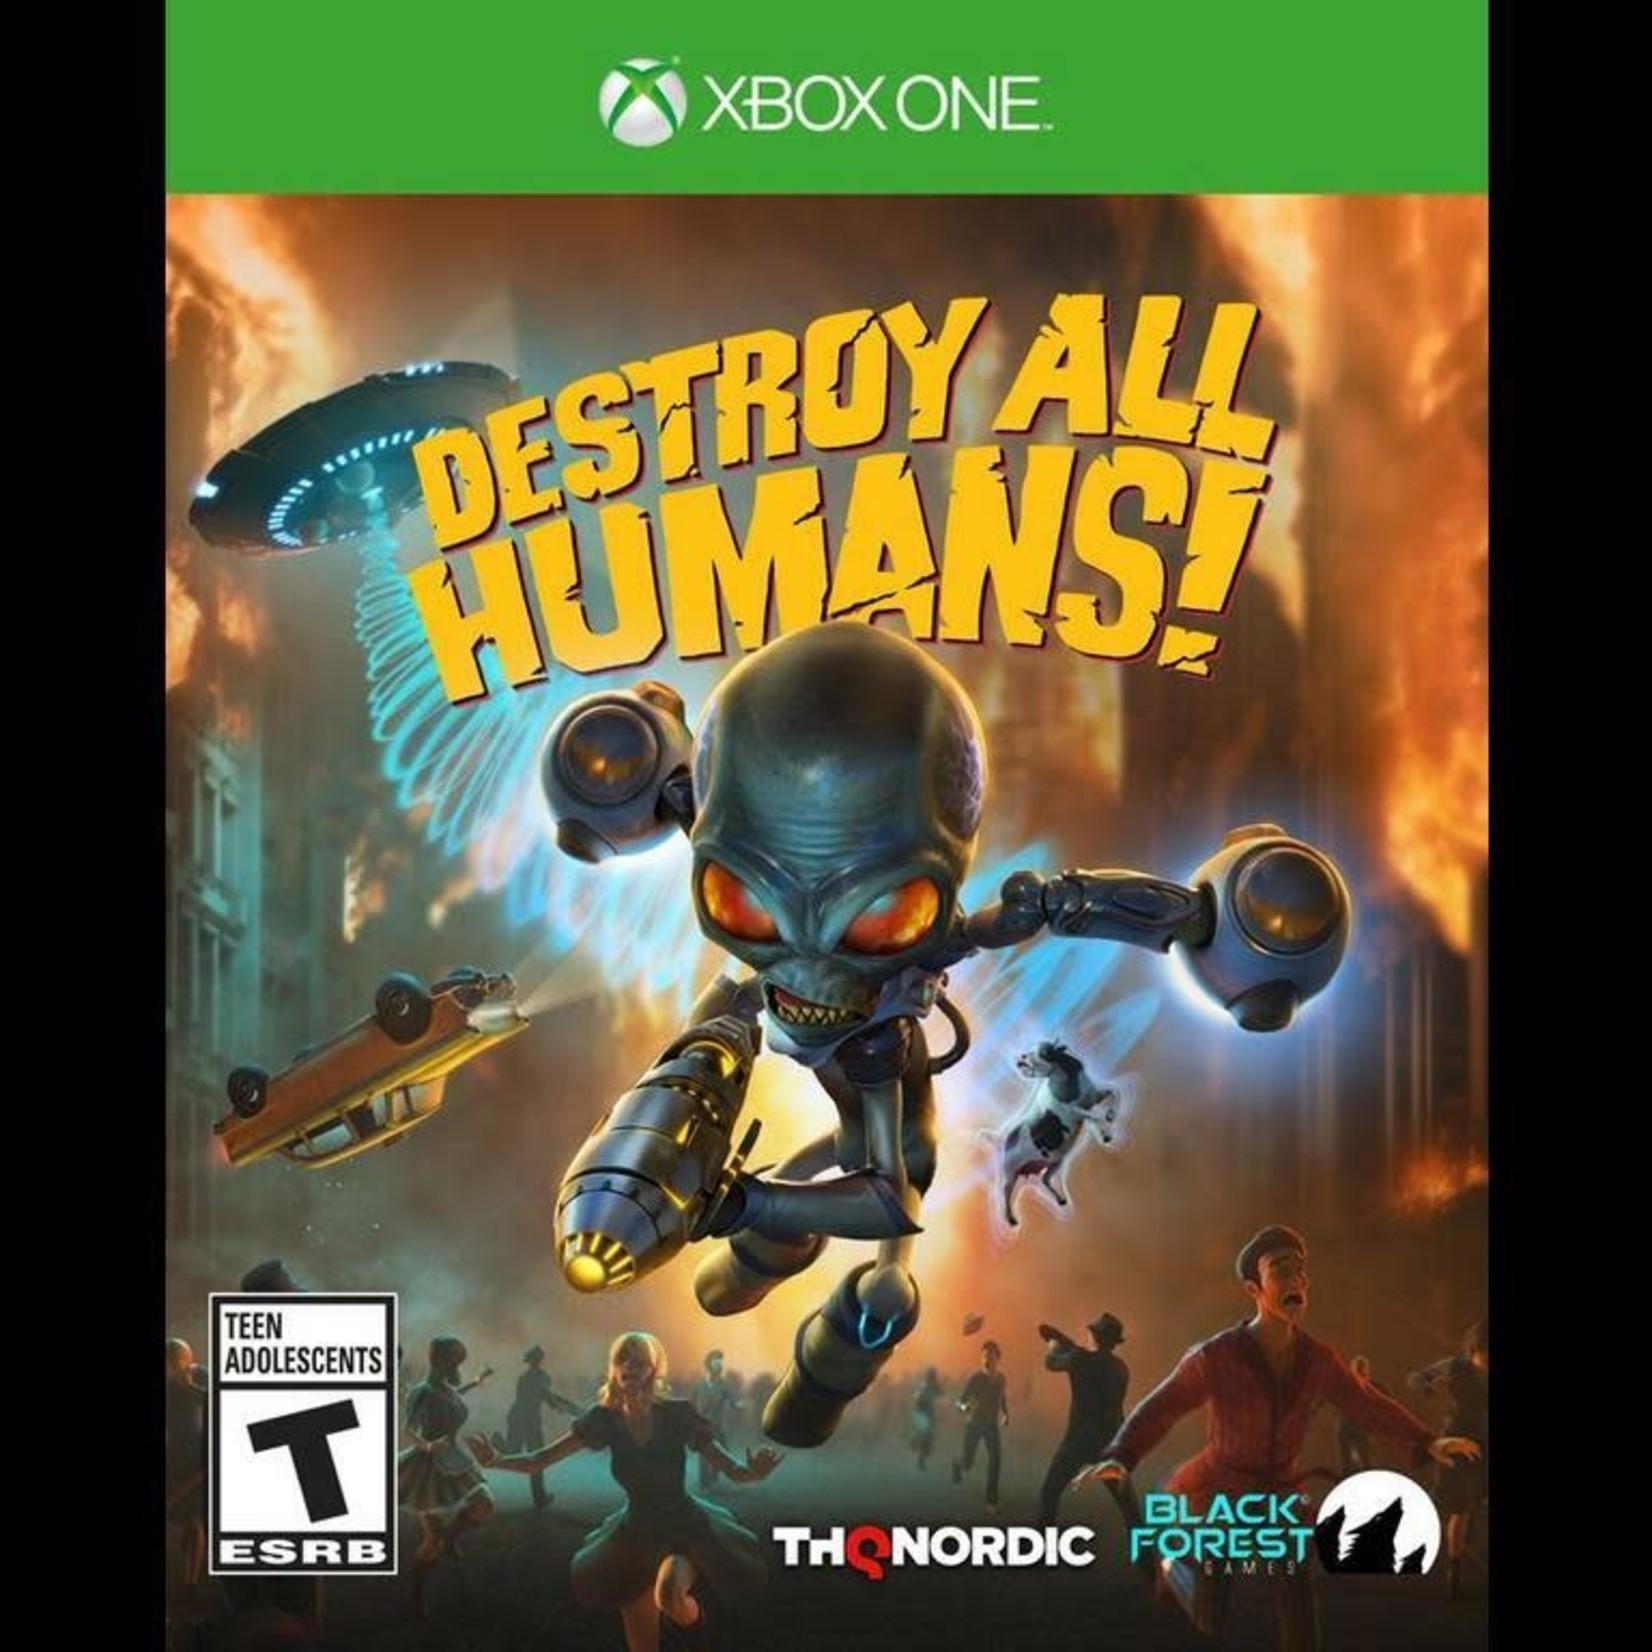 xb1-Destroy All Humans!